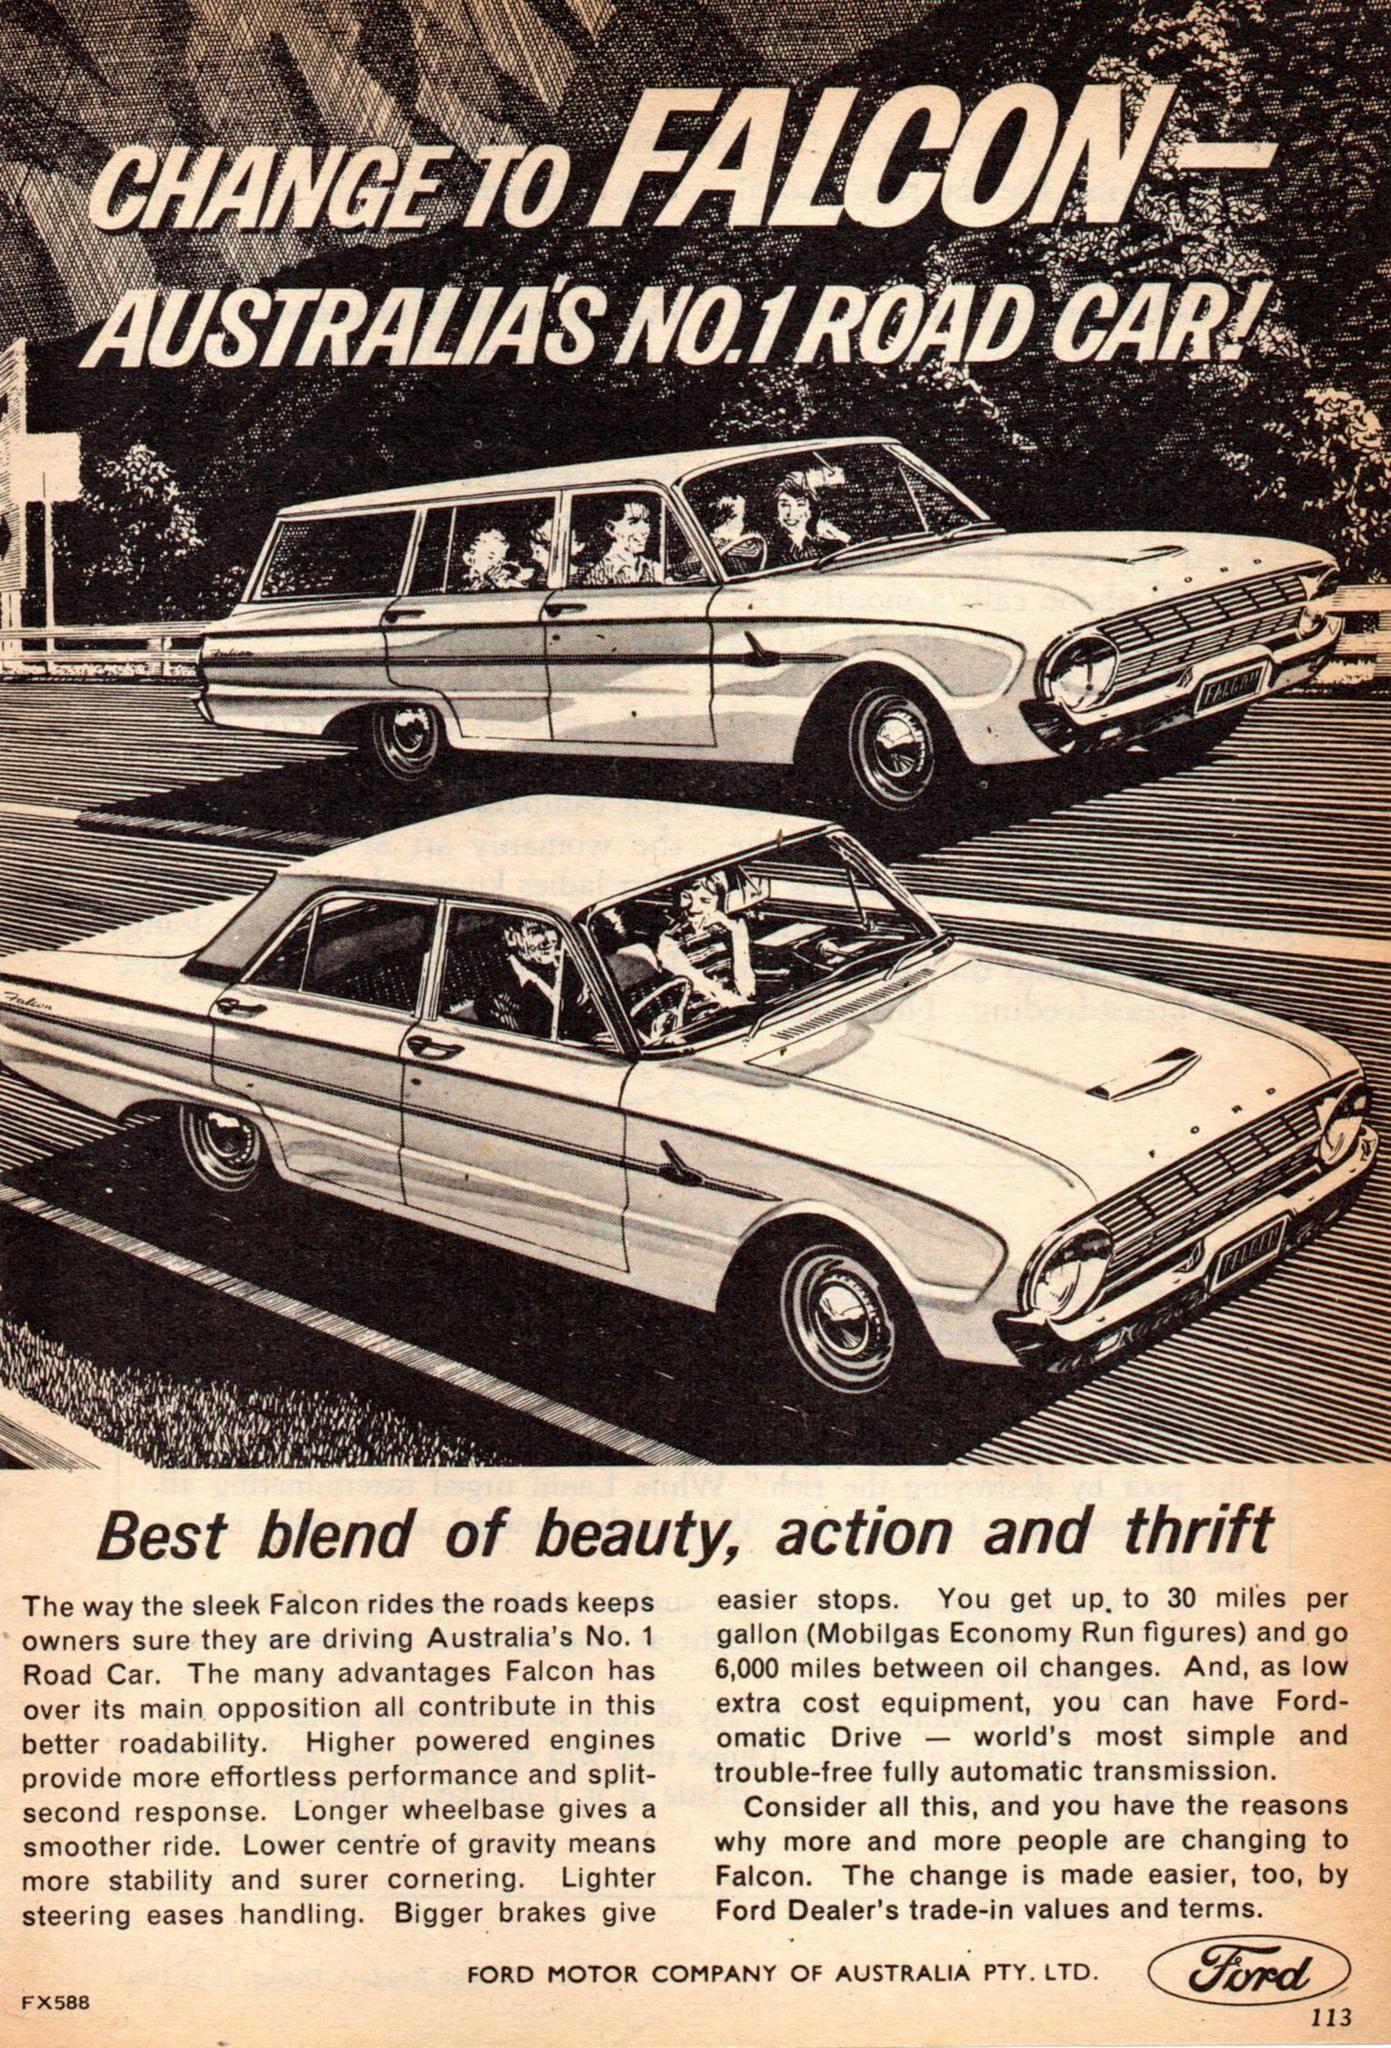 1963 Xl Ford Falcon Sedan Wagon Aussie Original Magazine Australia Engines Advertisement Pinterest Falcons And